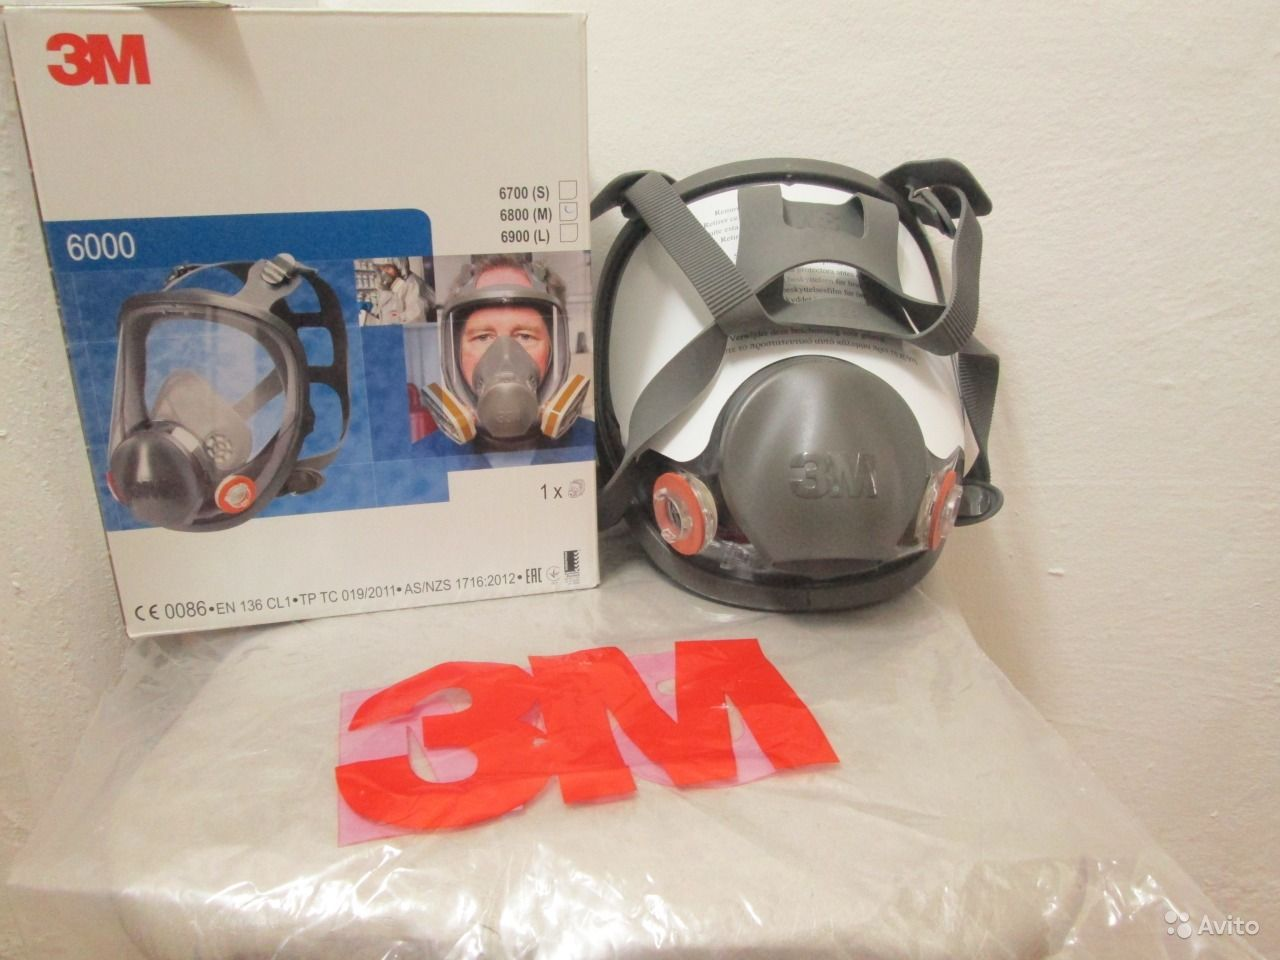 Полнолицевая маска 3М 6000 (6800 М) средн. разм  da5b30b0c9e4e